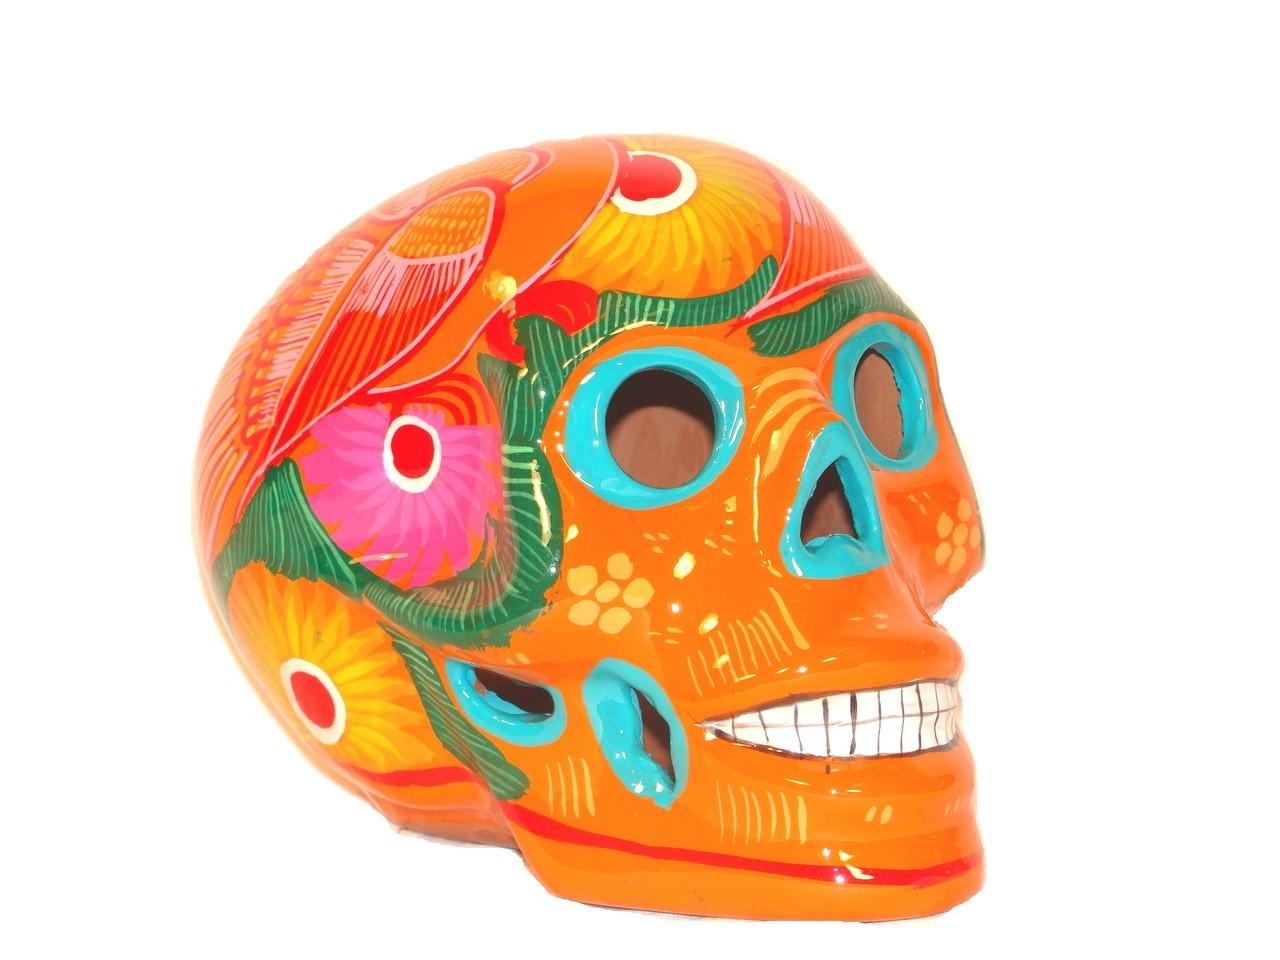 Paint Your Own Ceramic Keepsake Day of the Dead Skull Mask